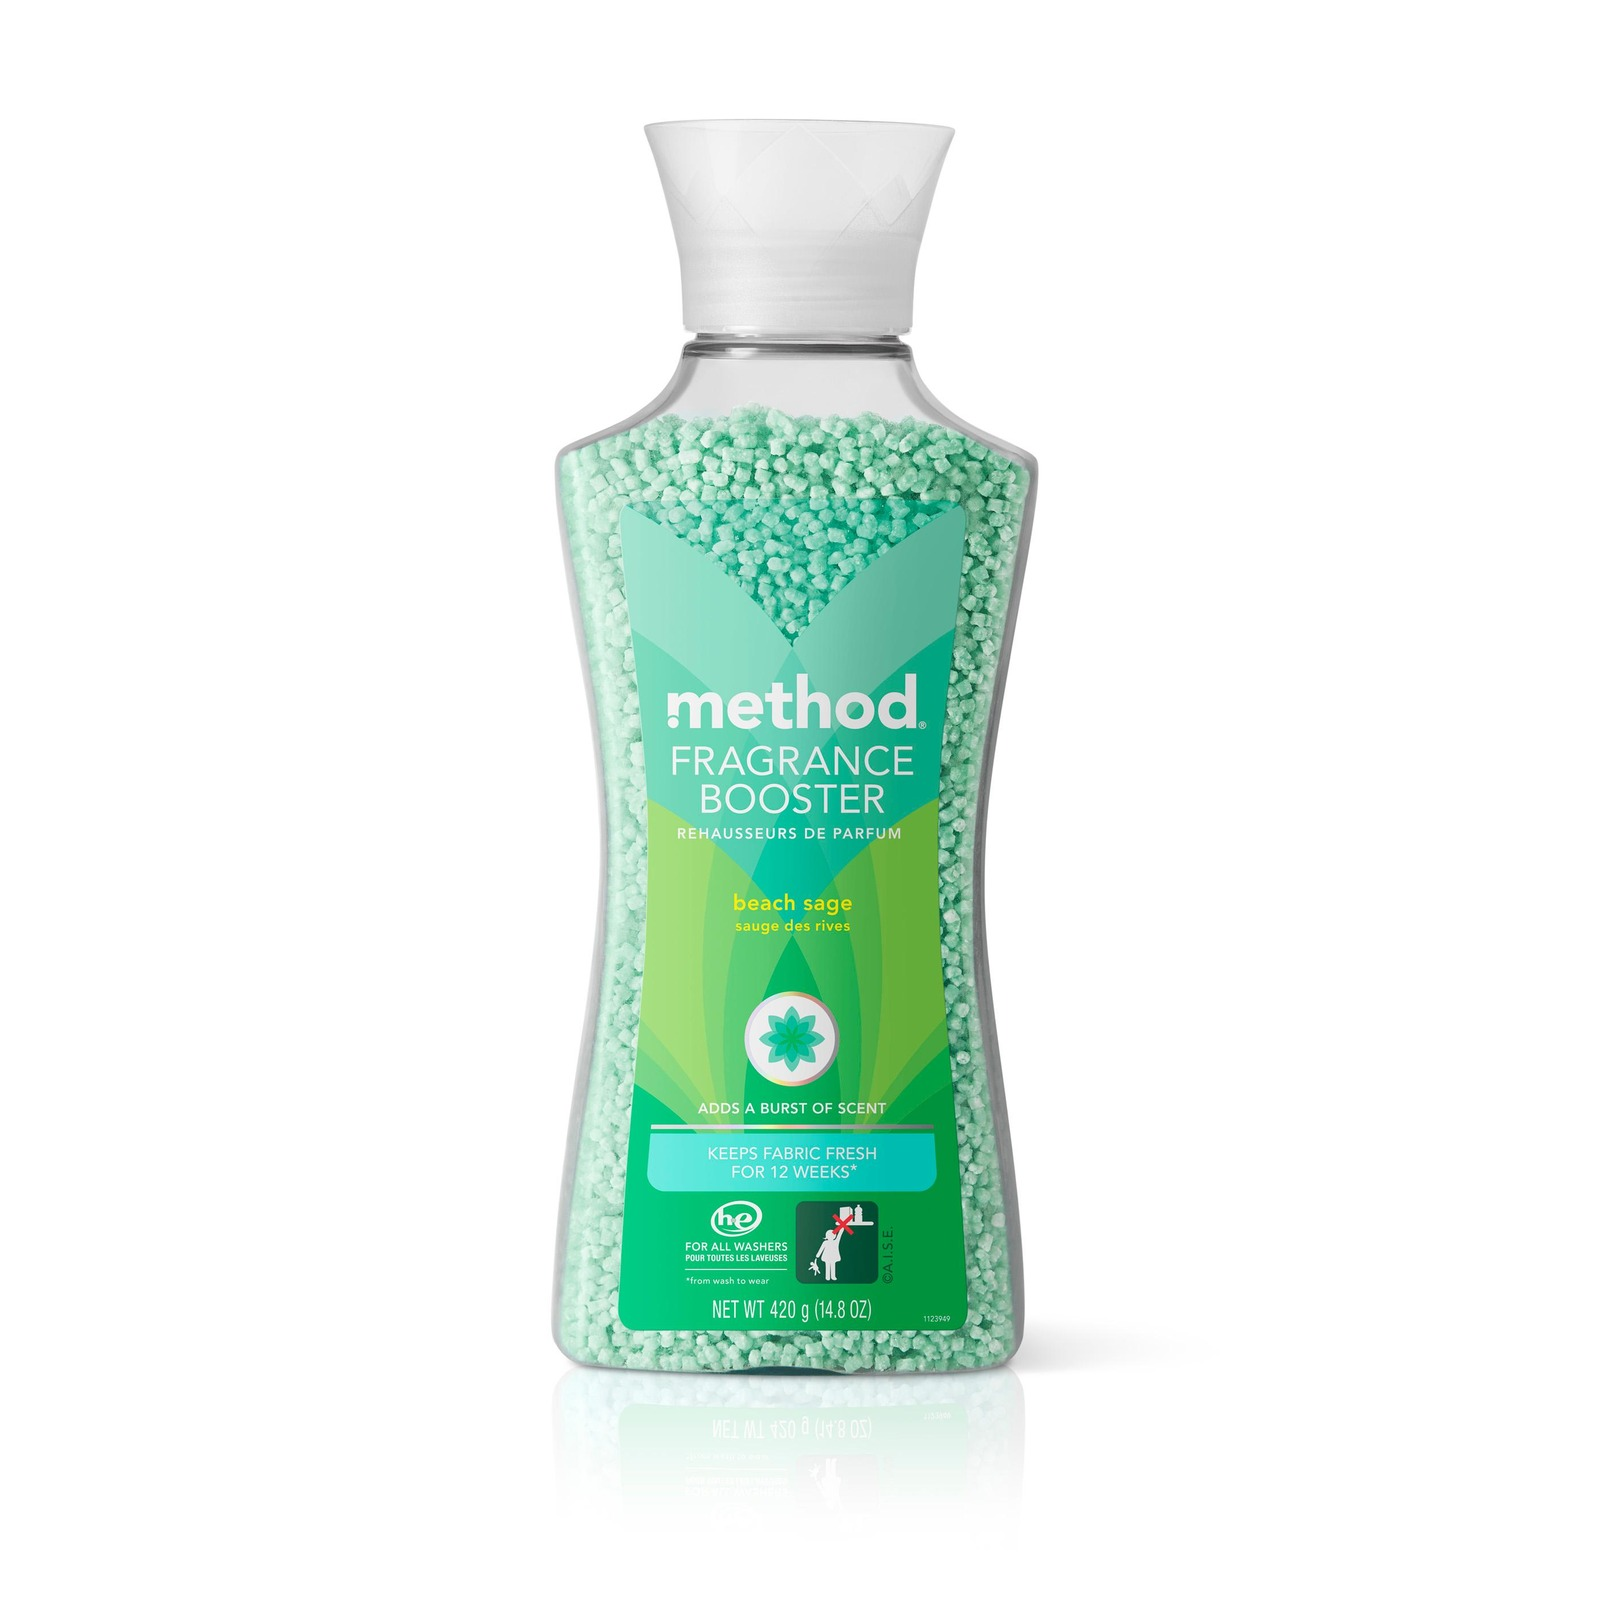 Method Fragrance Boosters - Beach Sage